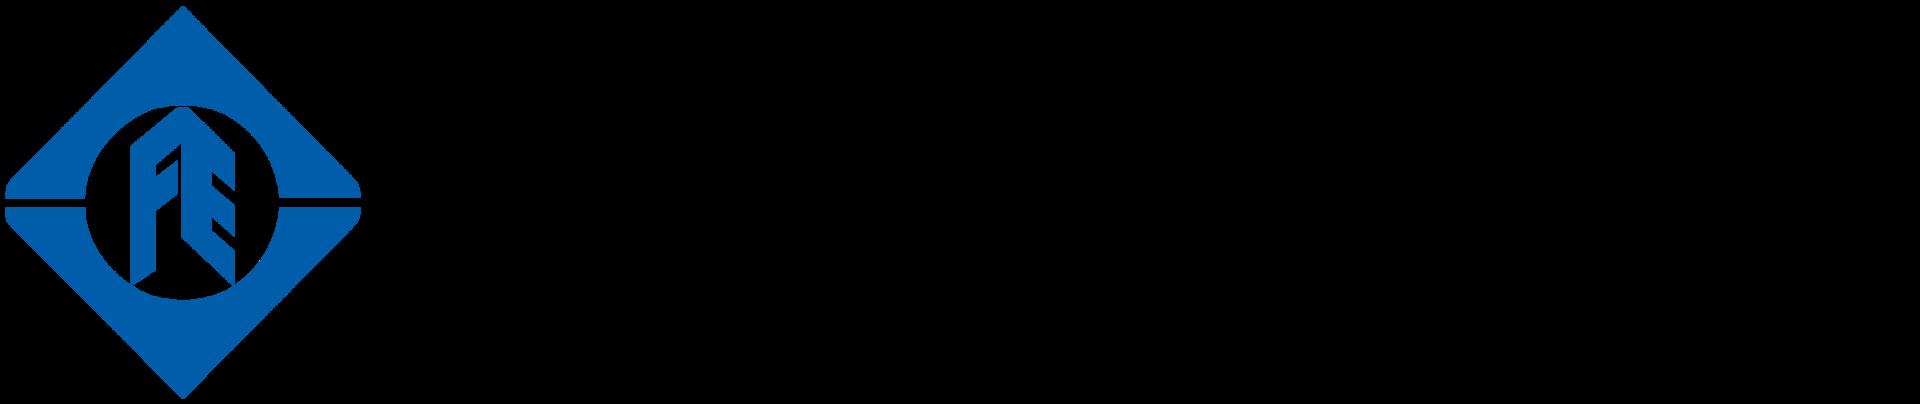 logo-doi-tac-duc-hung (3)